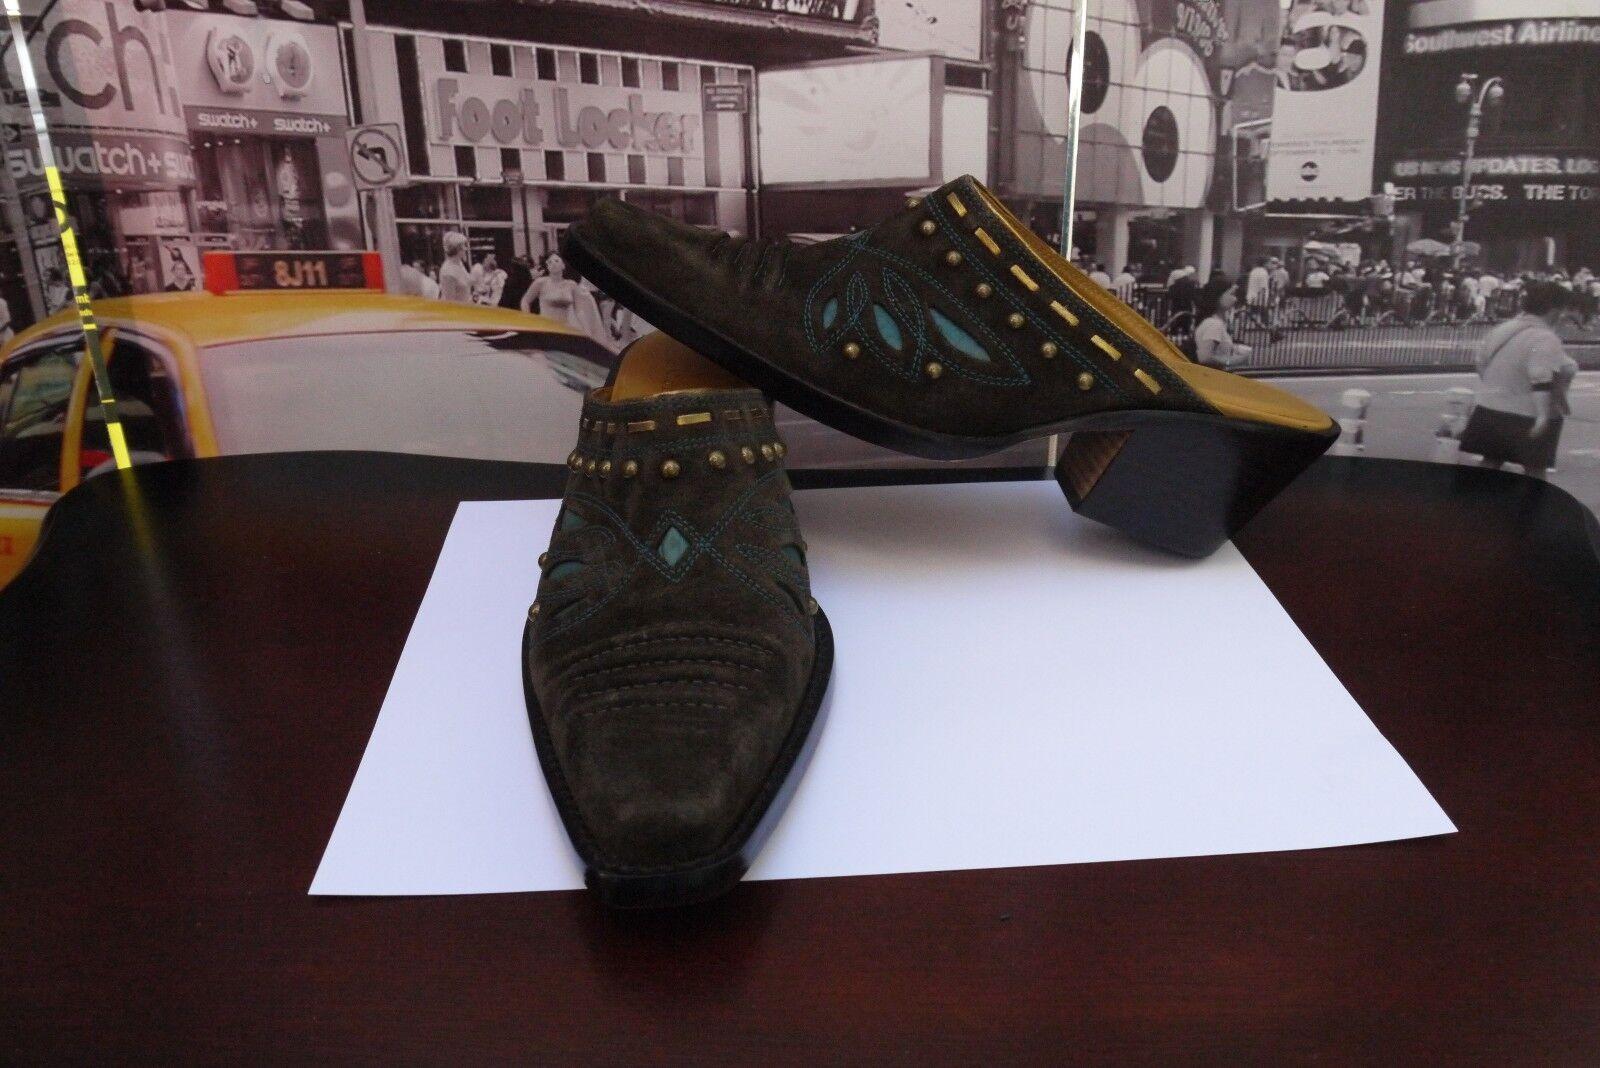 Cole Haan Morgan D18352 Gamuza Marrón Turquesa Western mula botas para mujer 6 B